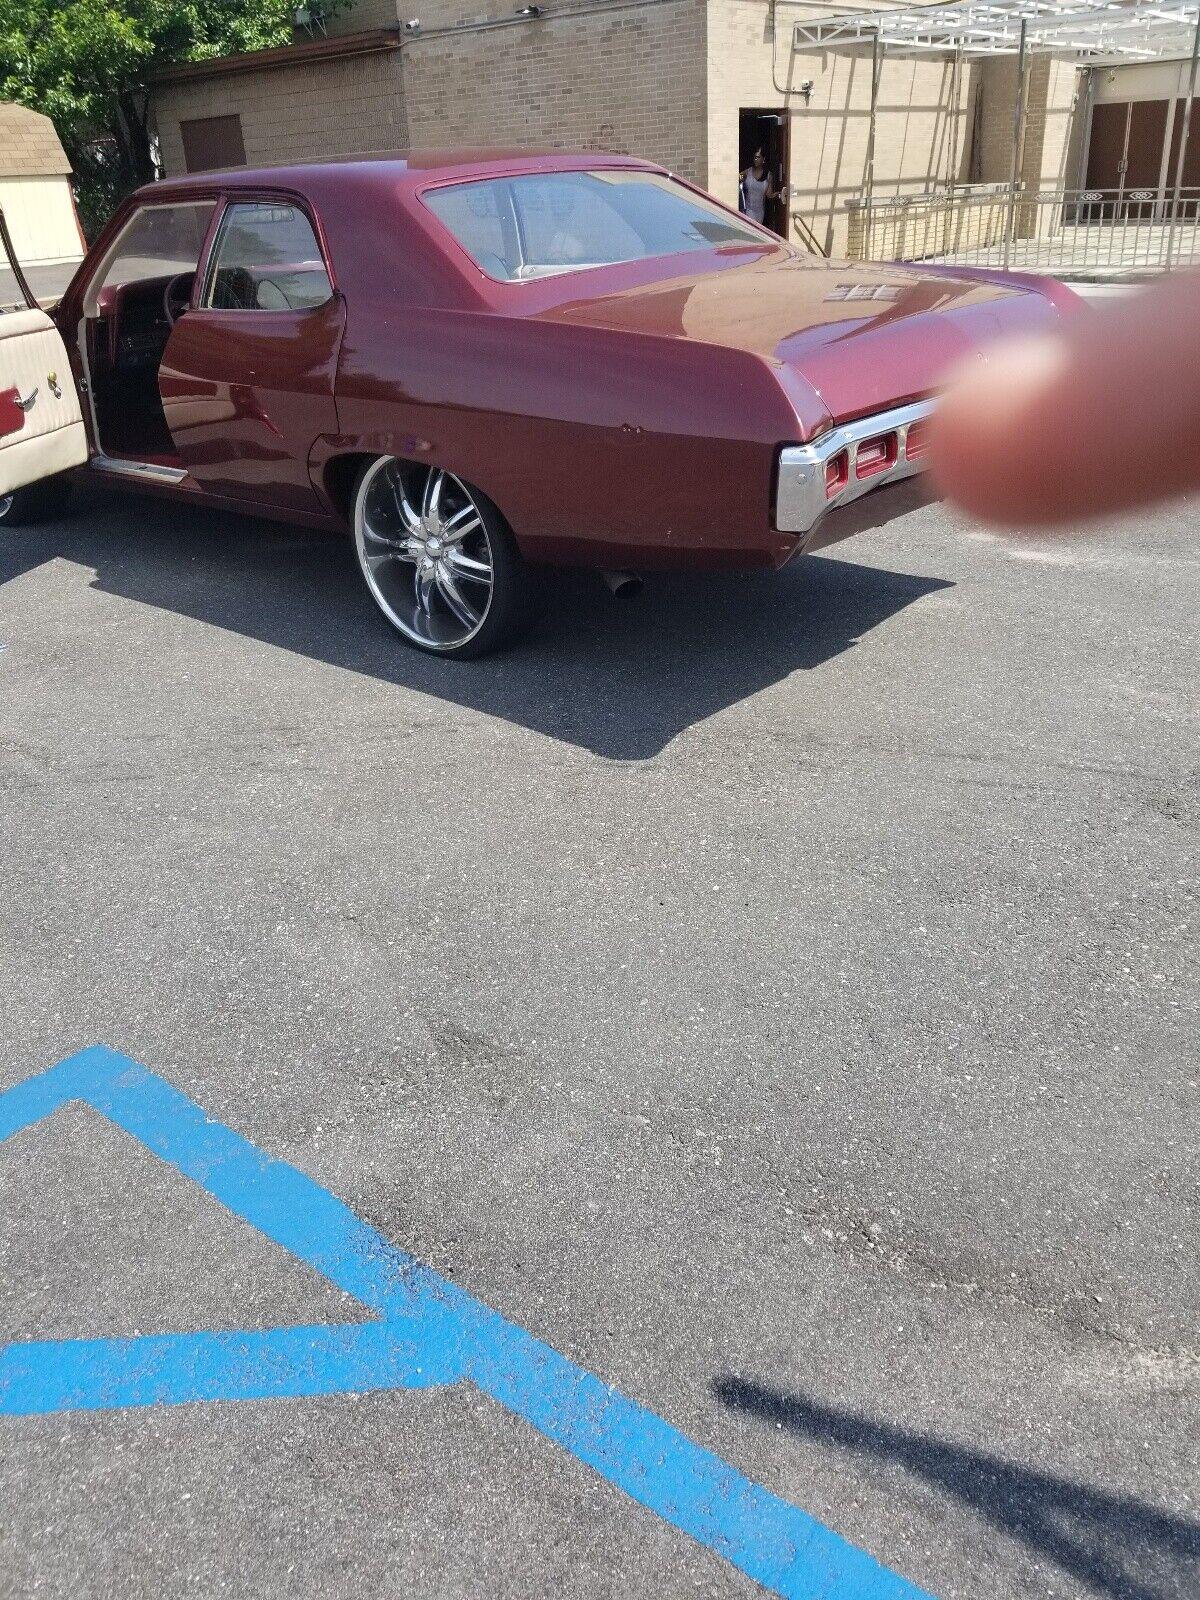 1969 Chevrolet Impala 5.7  1969 Chevrolet Impala 5.7 Red RWD Automatic